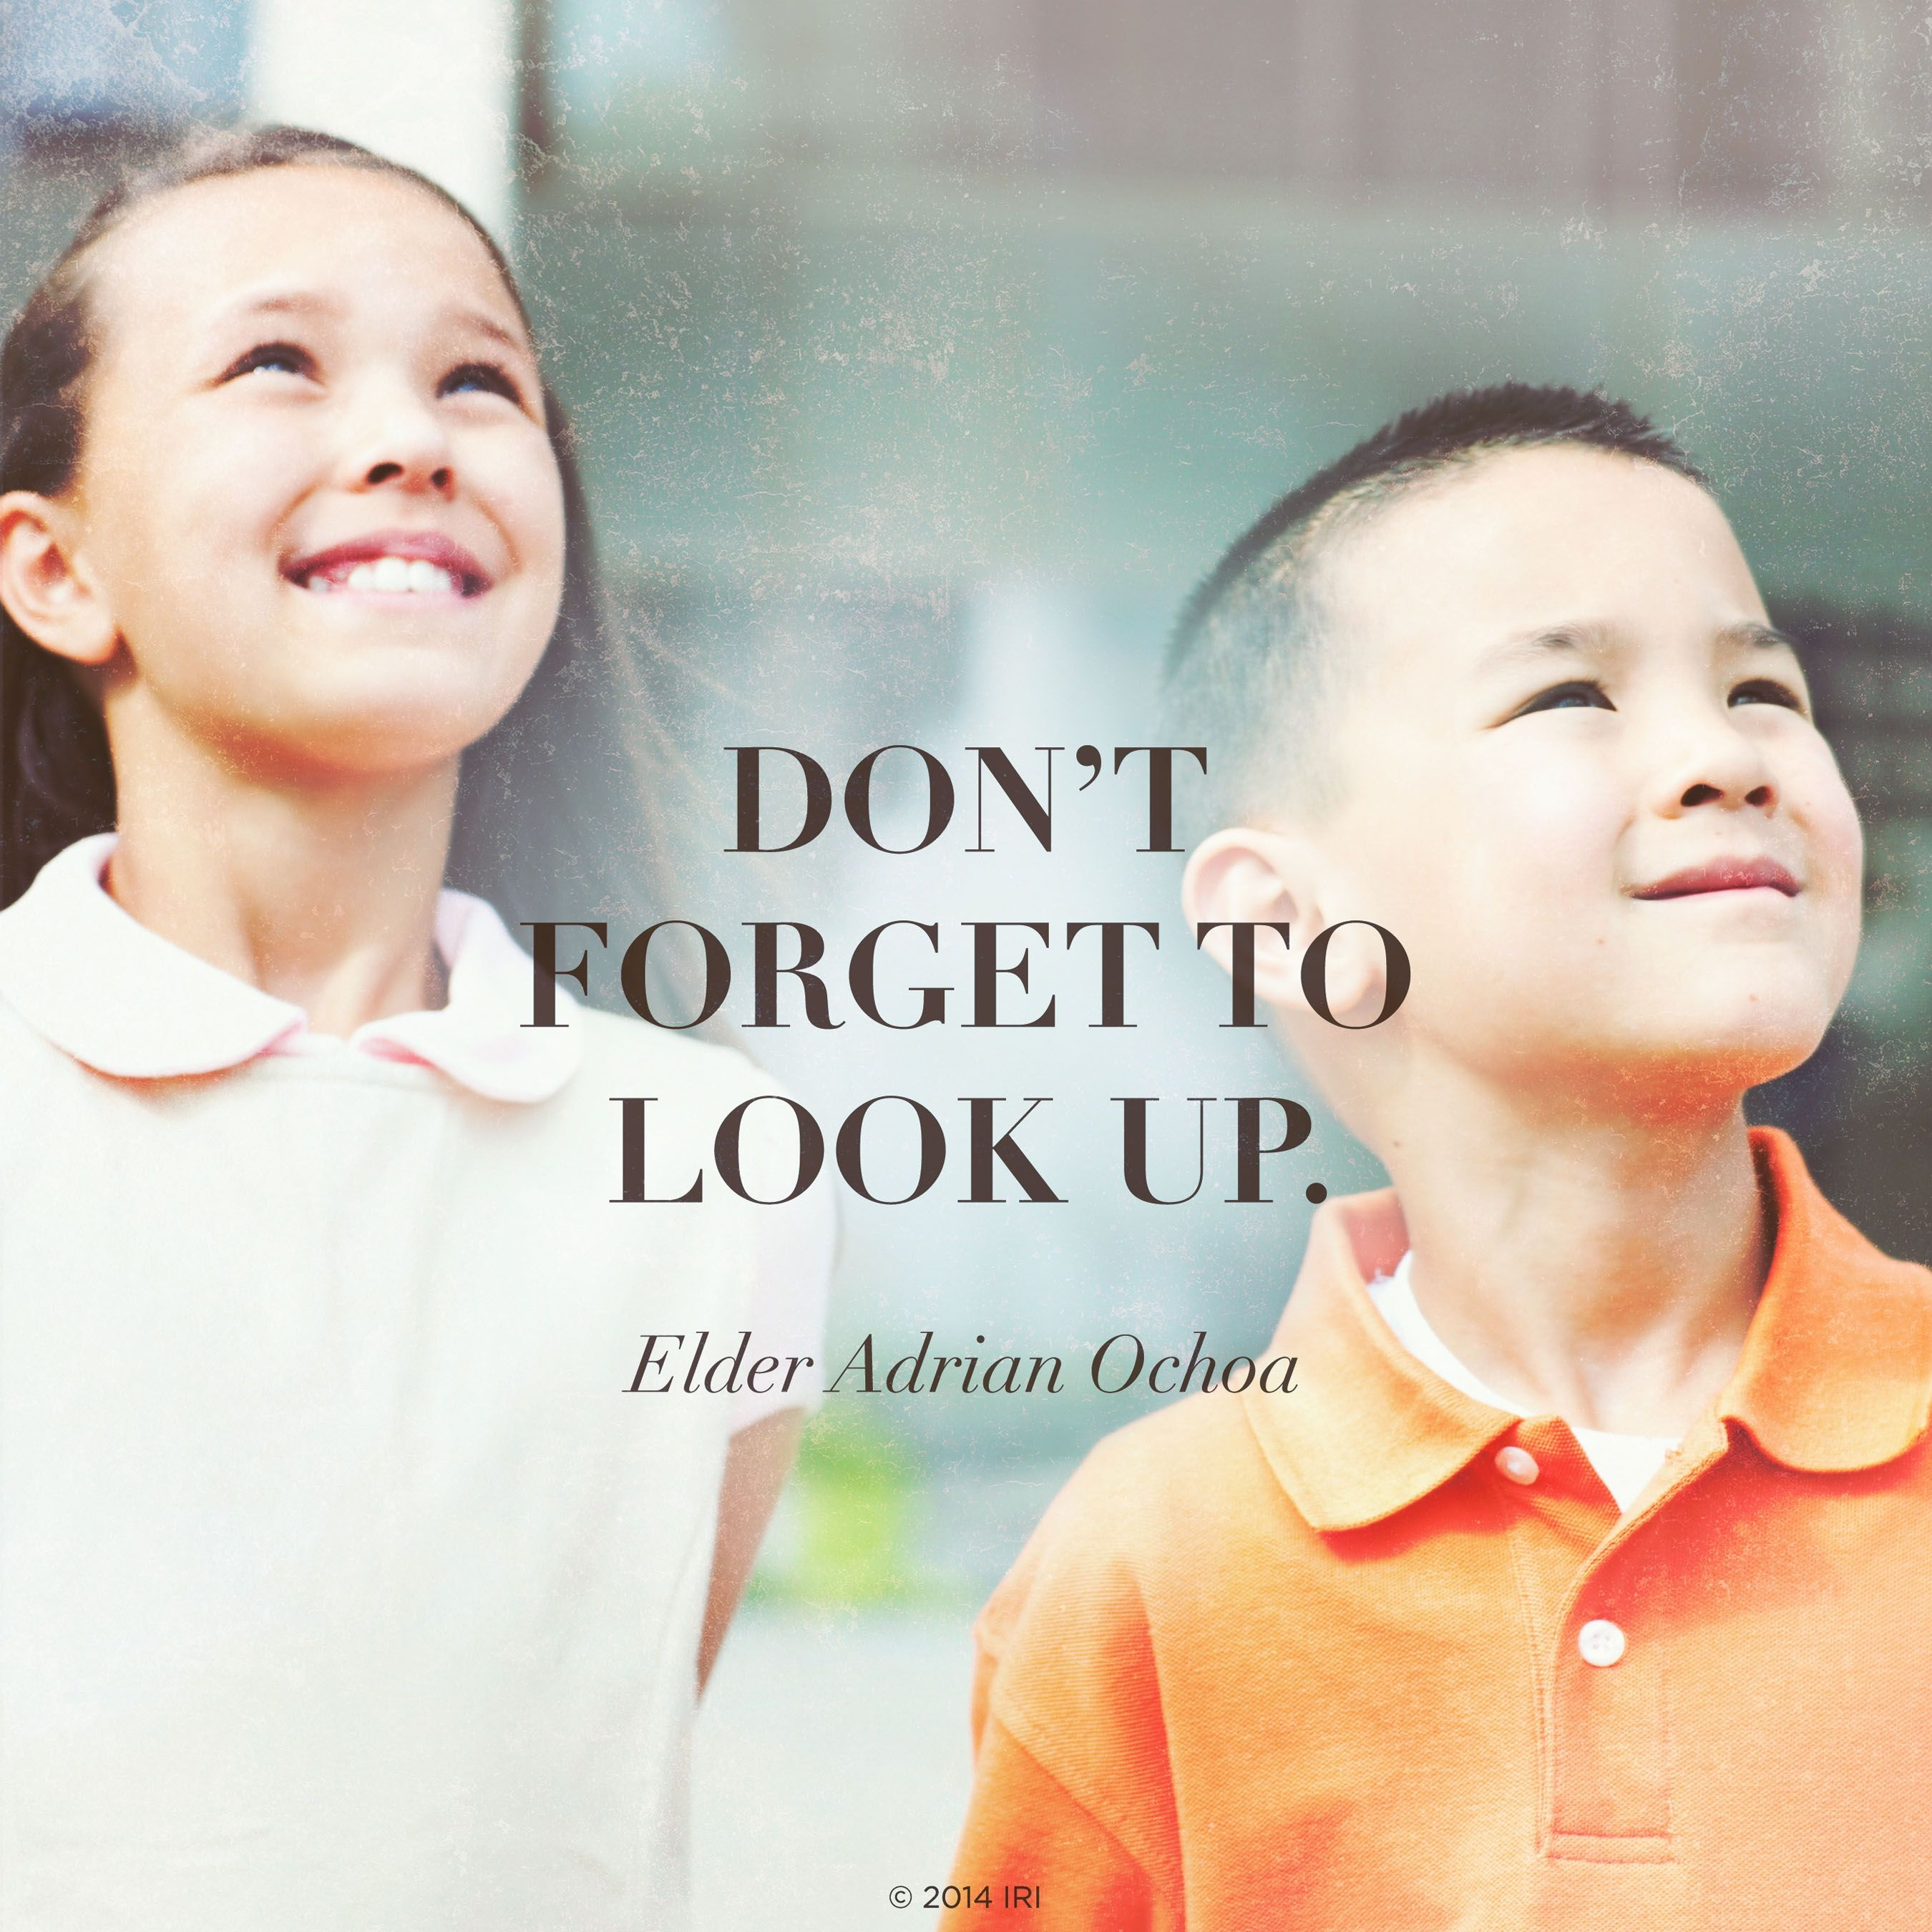 """Don't forget to look up.""—Elder Adrián Ochoa, ""Look Up"""